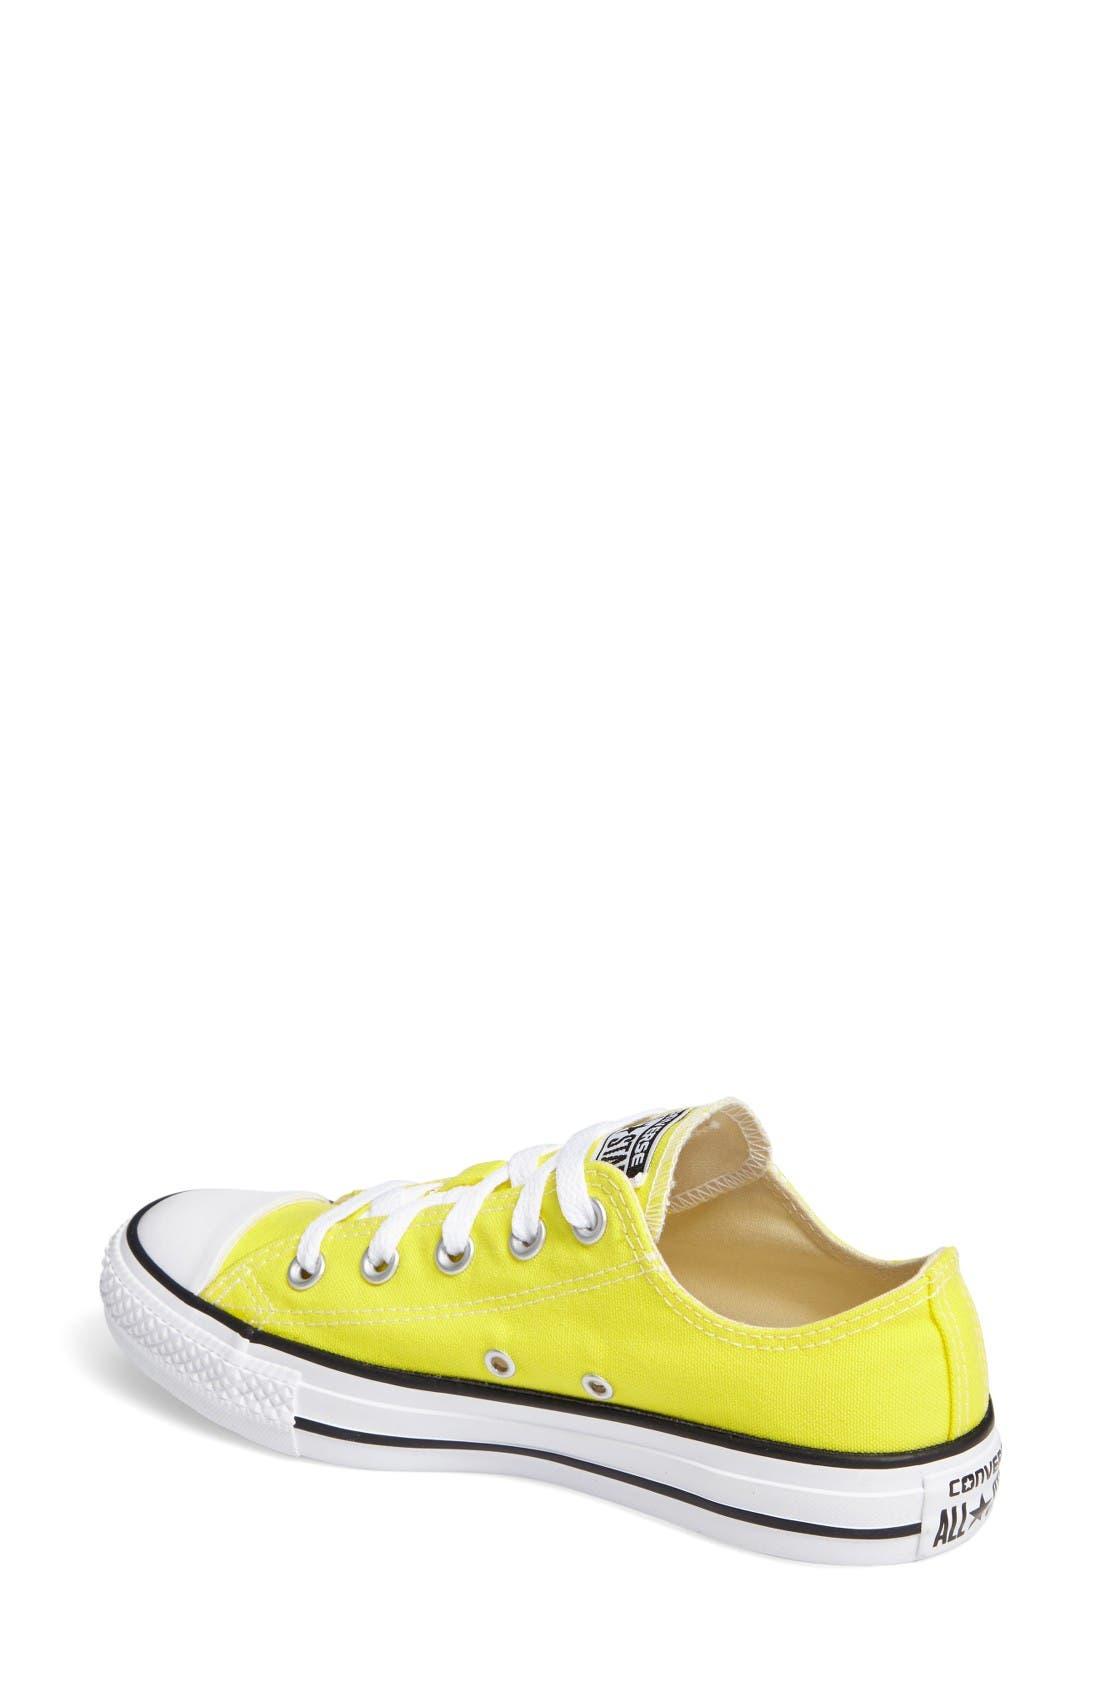 Alternate Image 2  - Converse Chuck Taylor® All Star® Seasonal Ox Low Top Sneaker (Women)